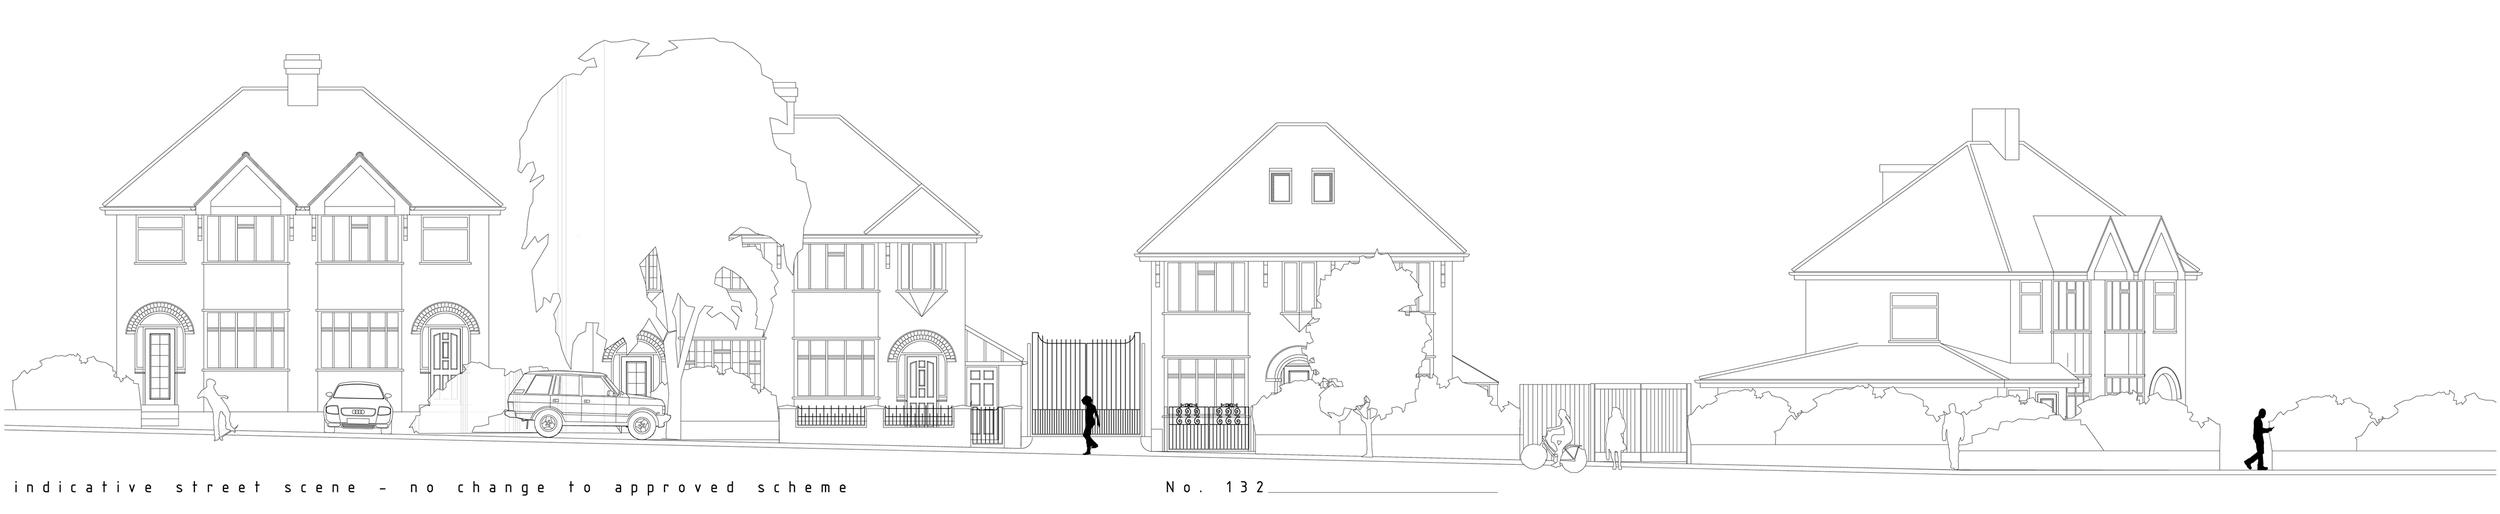 street elevation .jpg